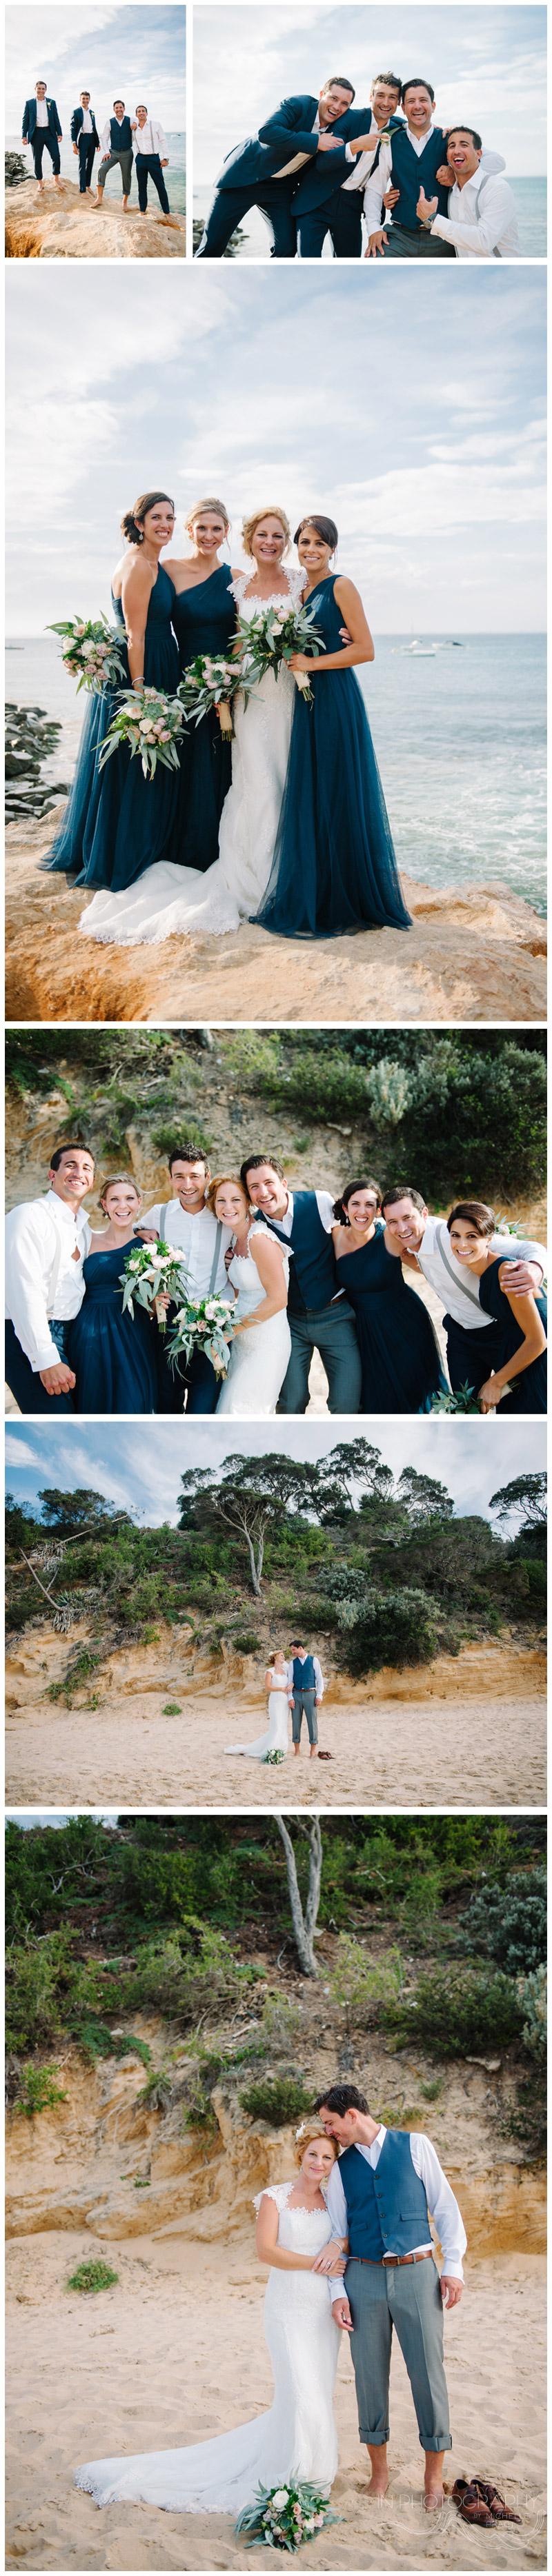 wedding photos at Portsea Hotel